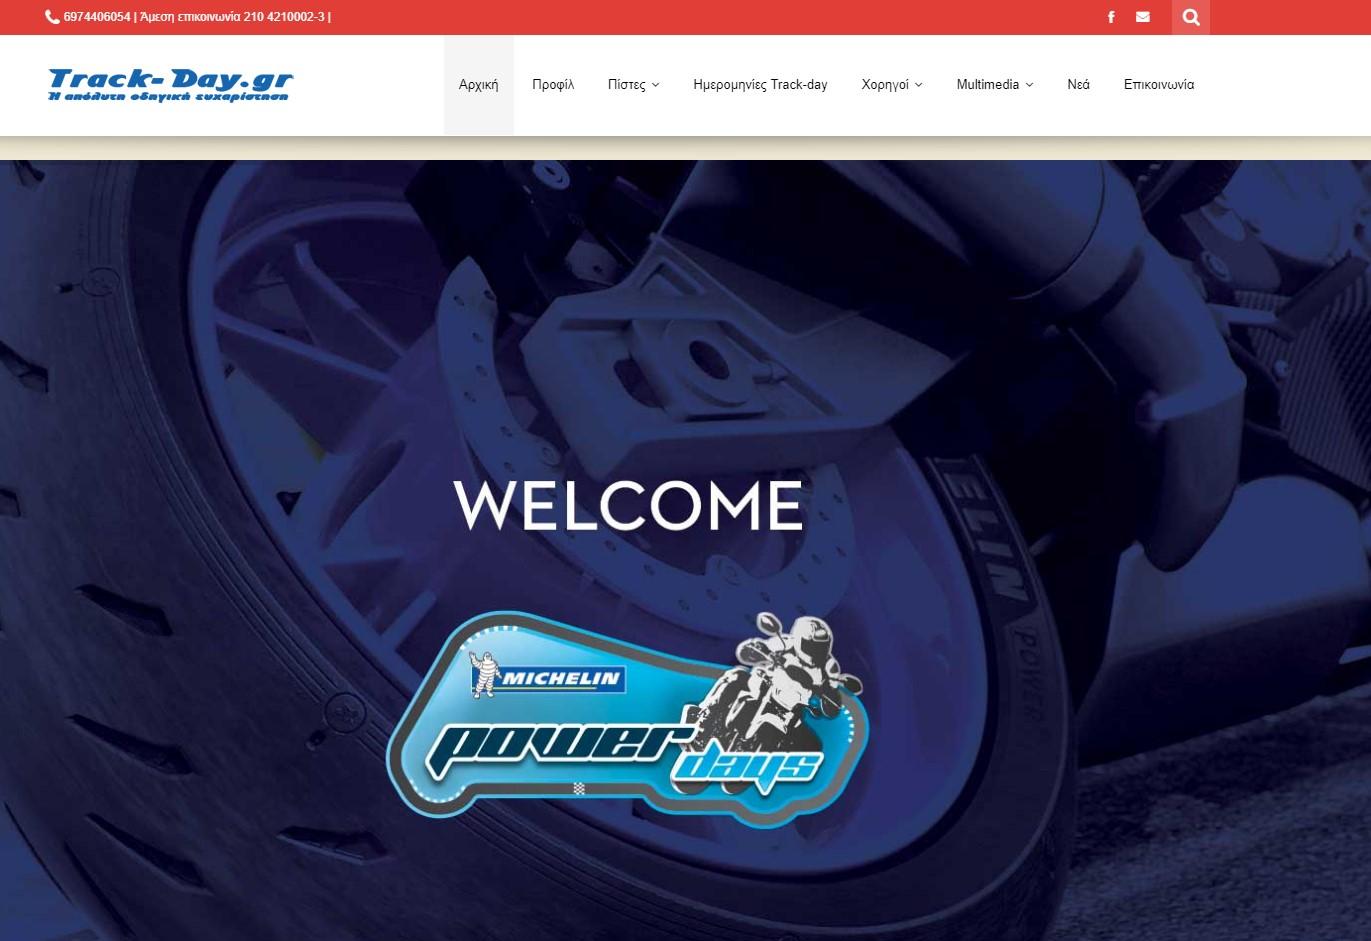 Track-day.gr - Κατασκευή ιστοσελίδας σε WordPress